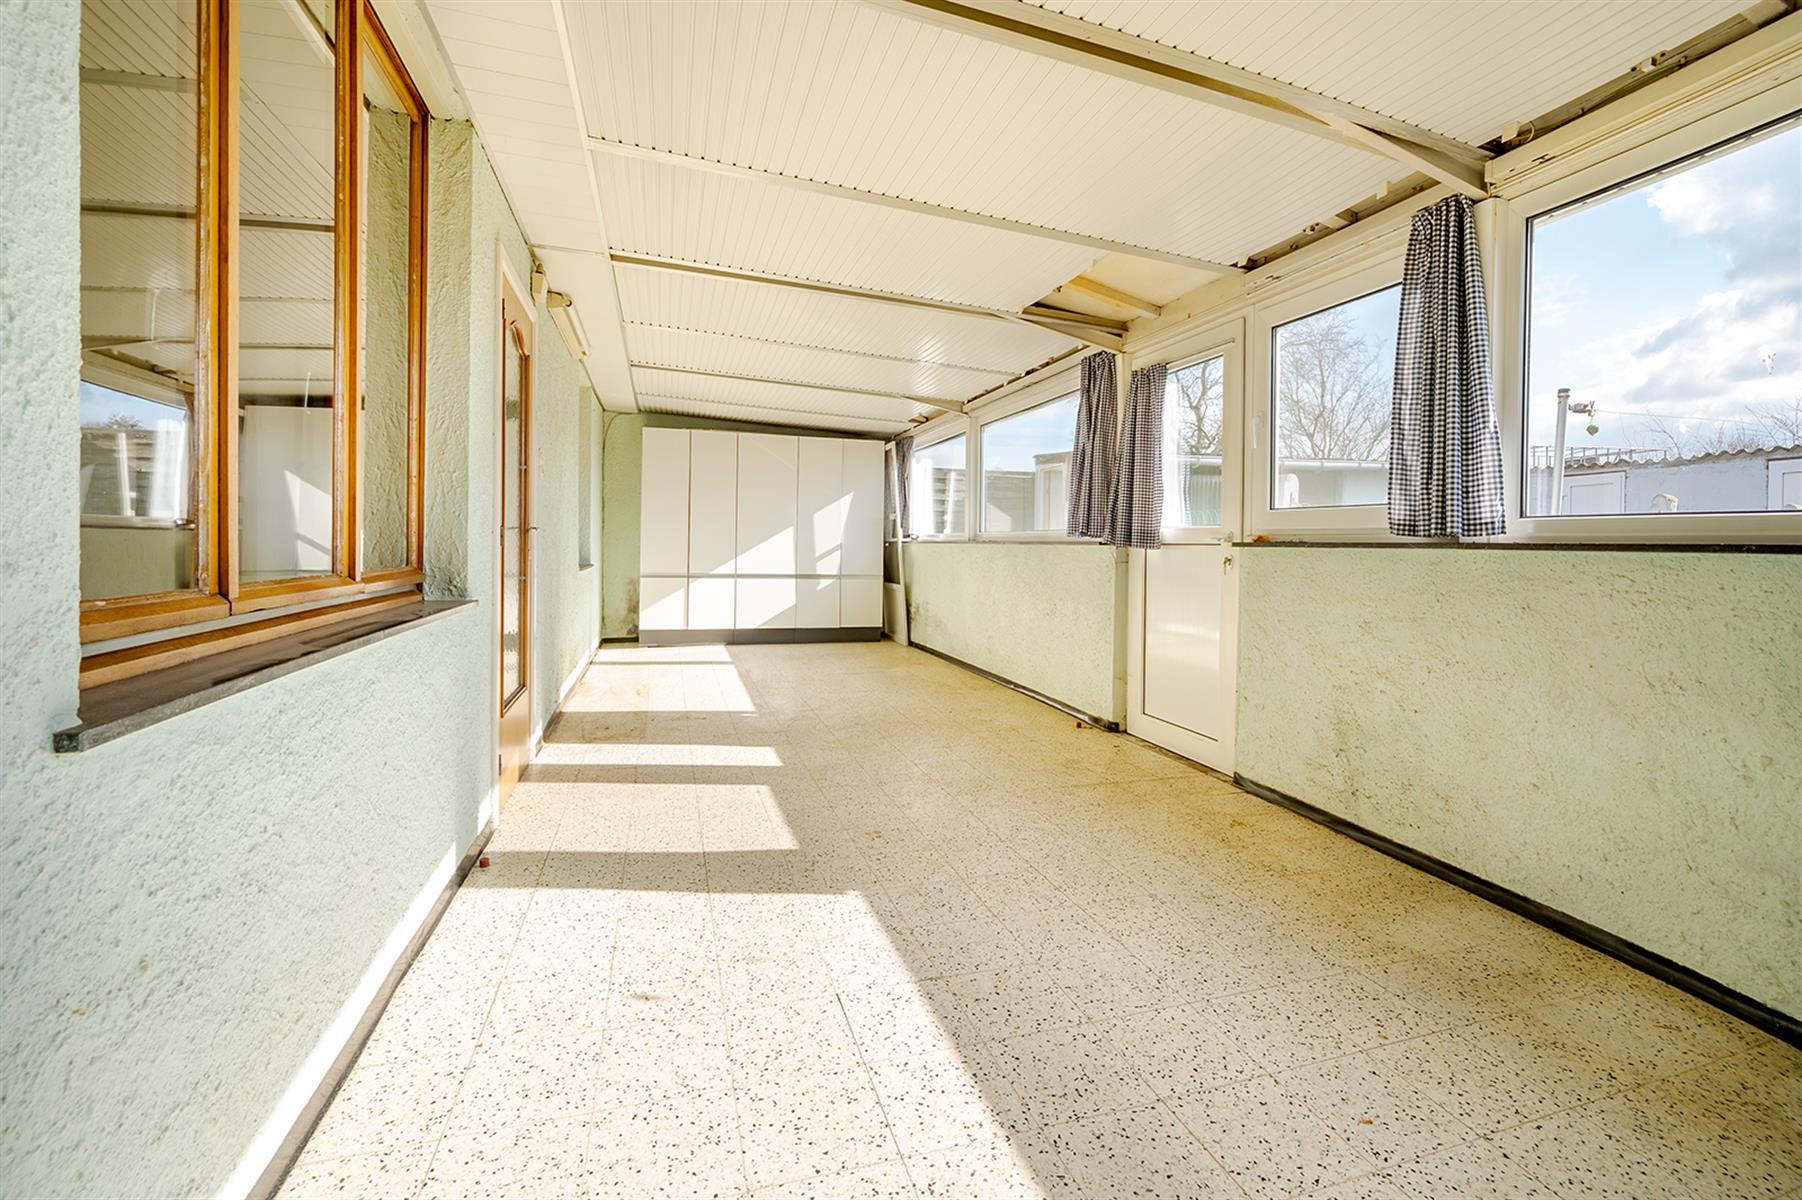 Maison - Remicourt - #4293207-8